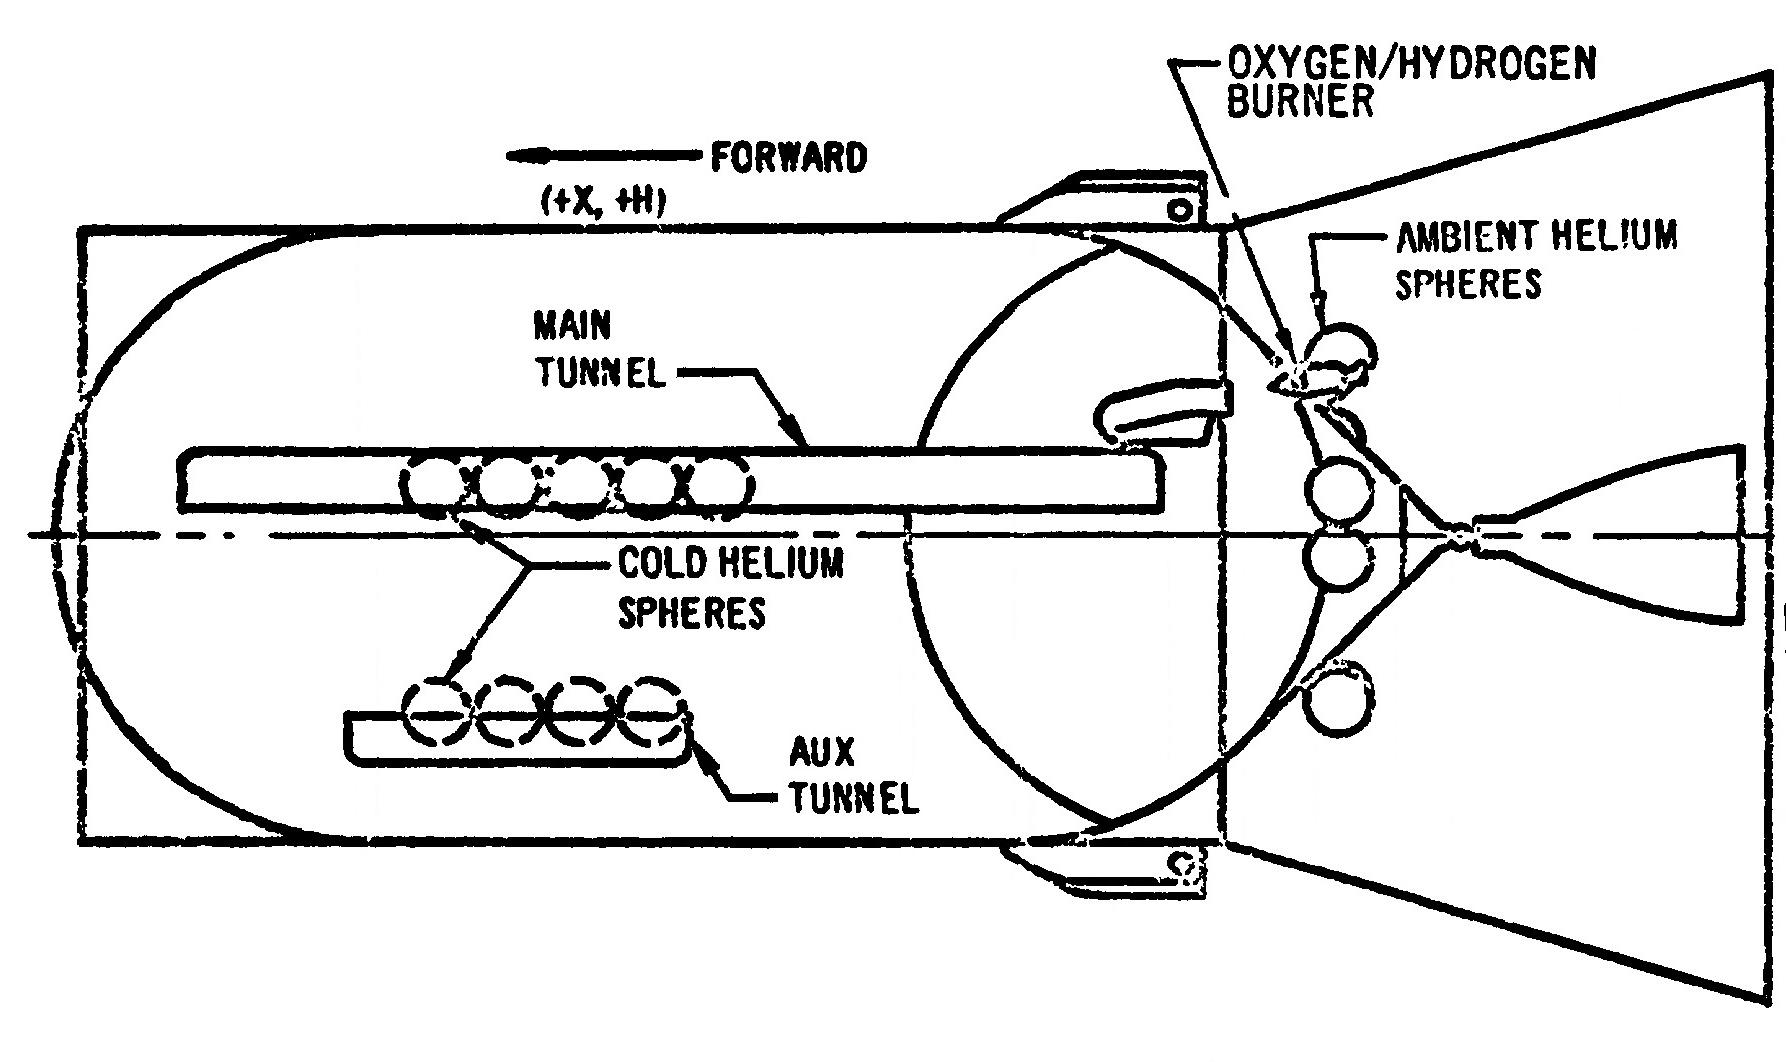 S Ivb Saturn V Propellant Tank Pressurization 5 Rocket